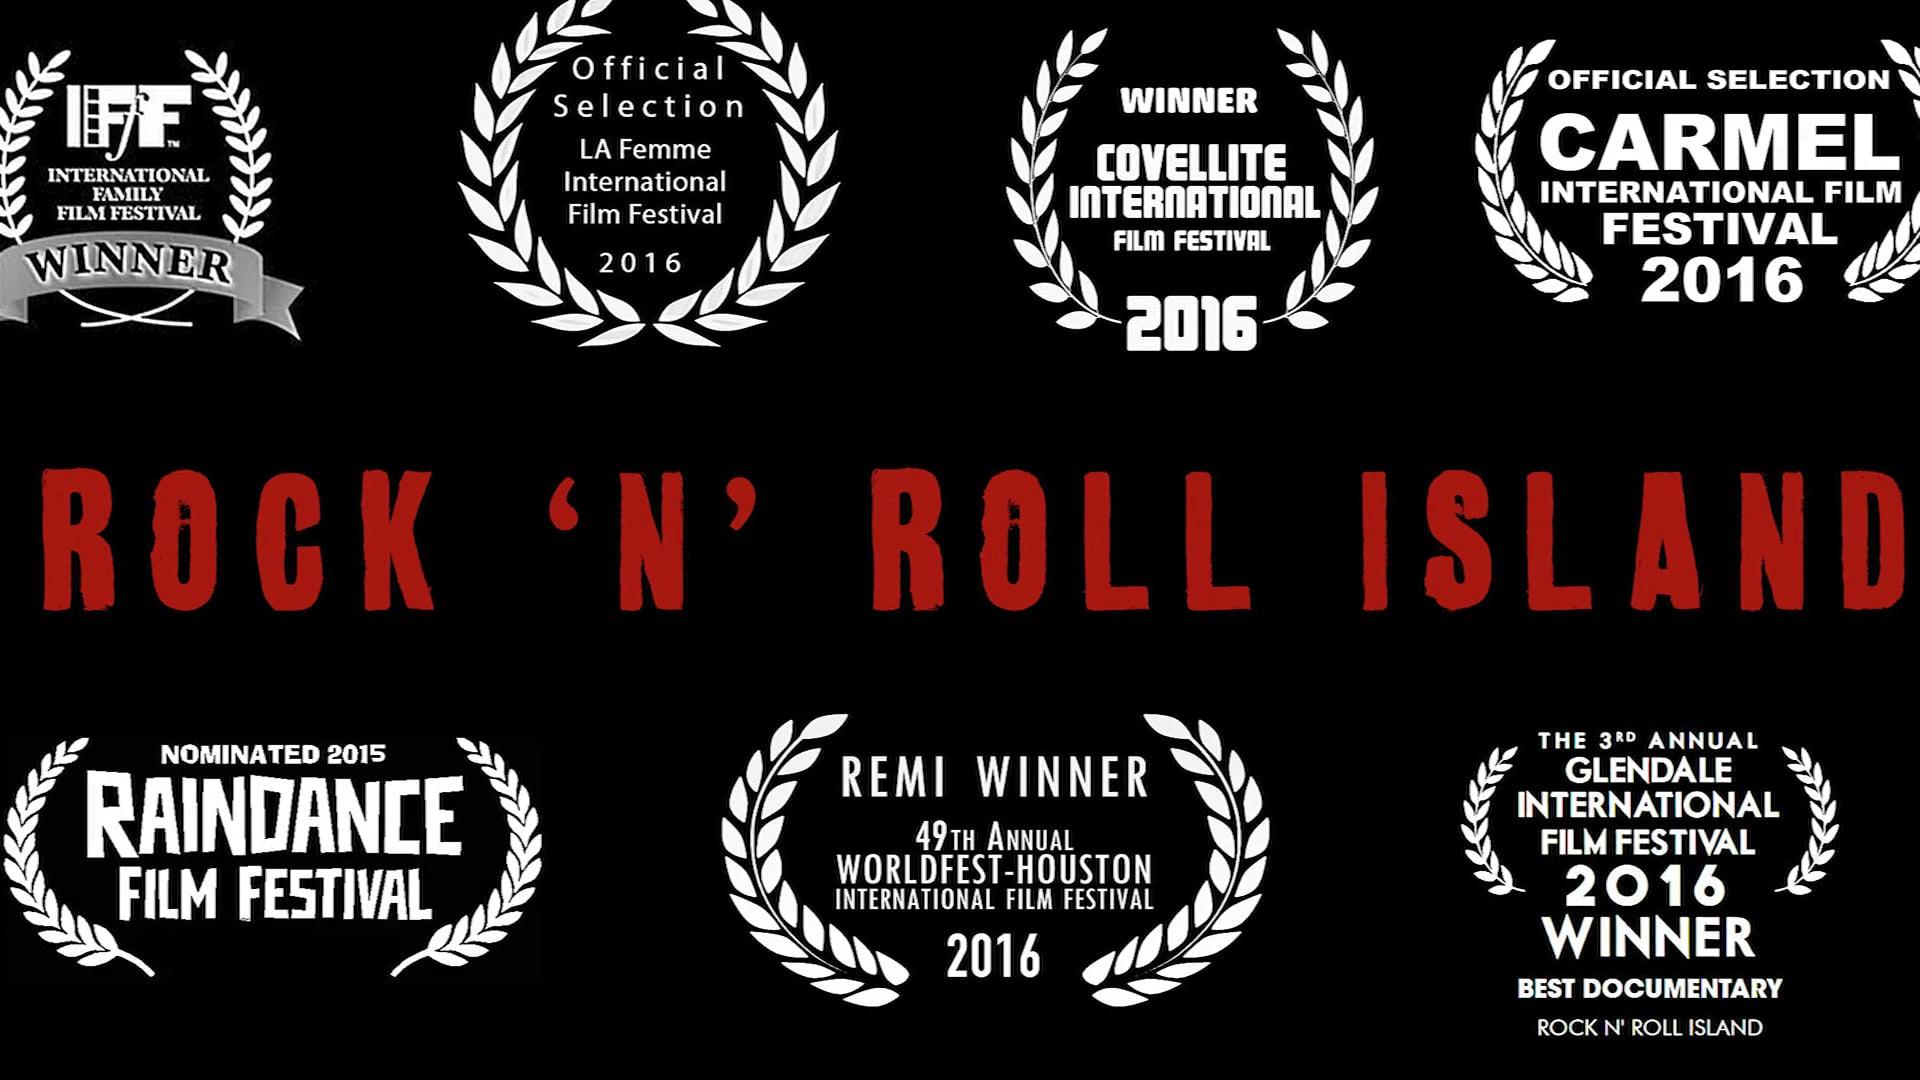 A trailer for Rock n Roll Island